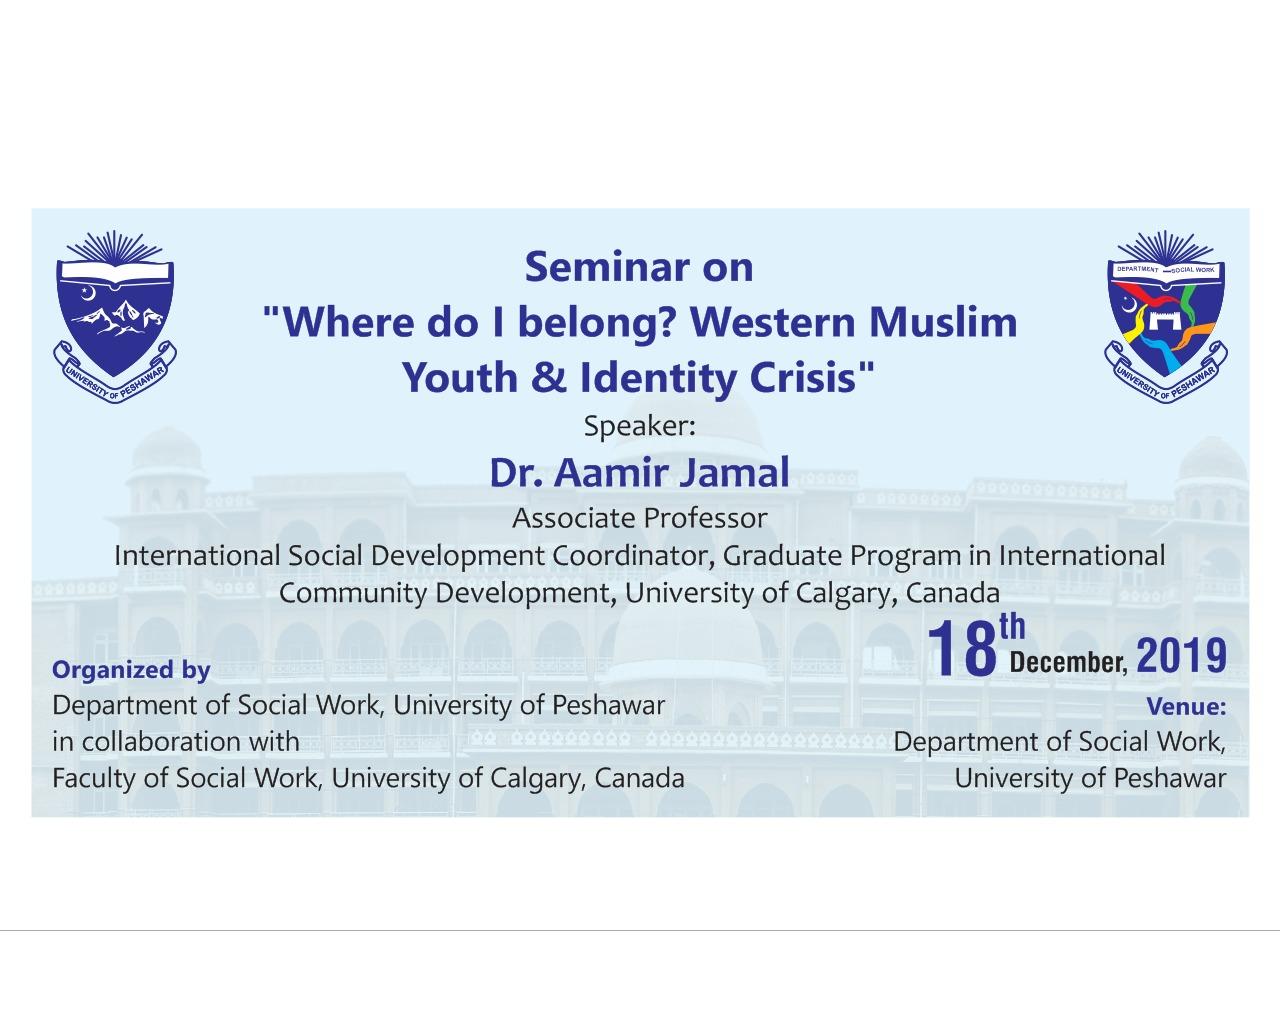 Where Do I belong? Western Muslims Youth & Identity Crisis